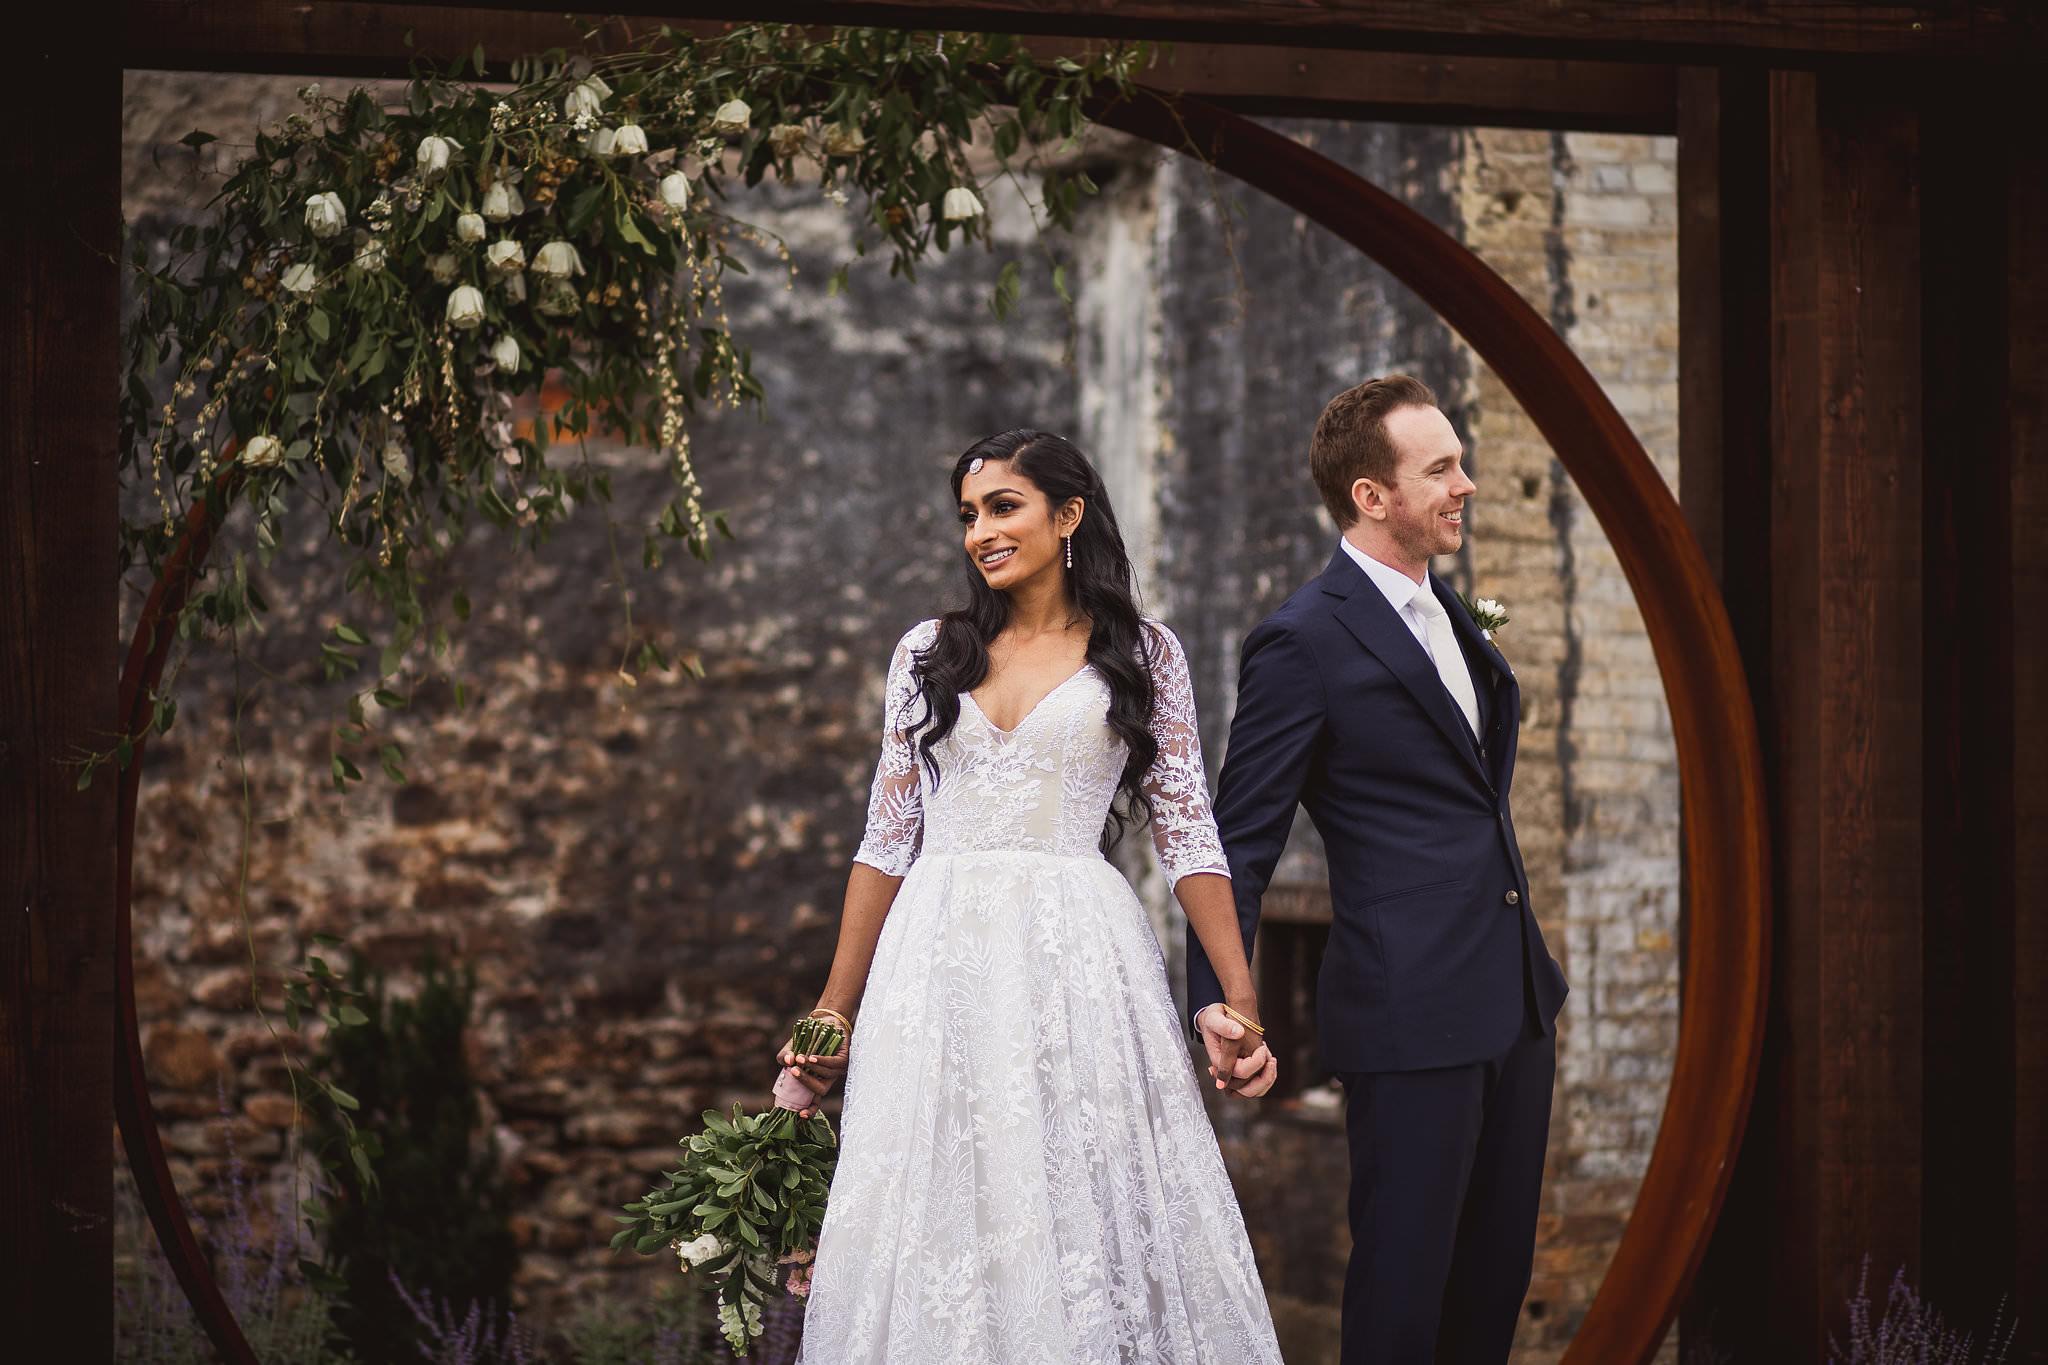 foundry building wedding photos